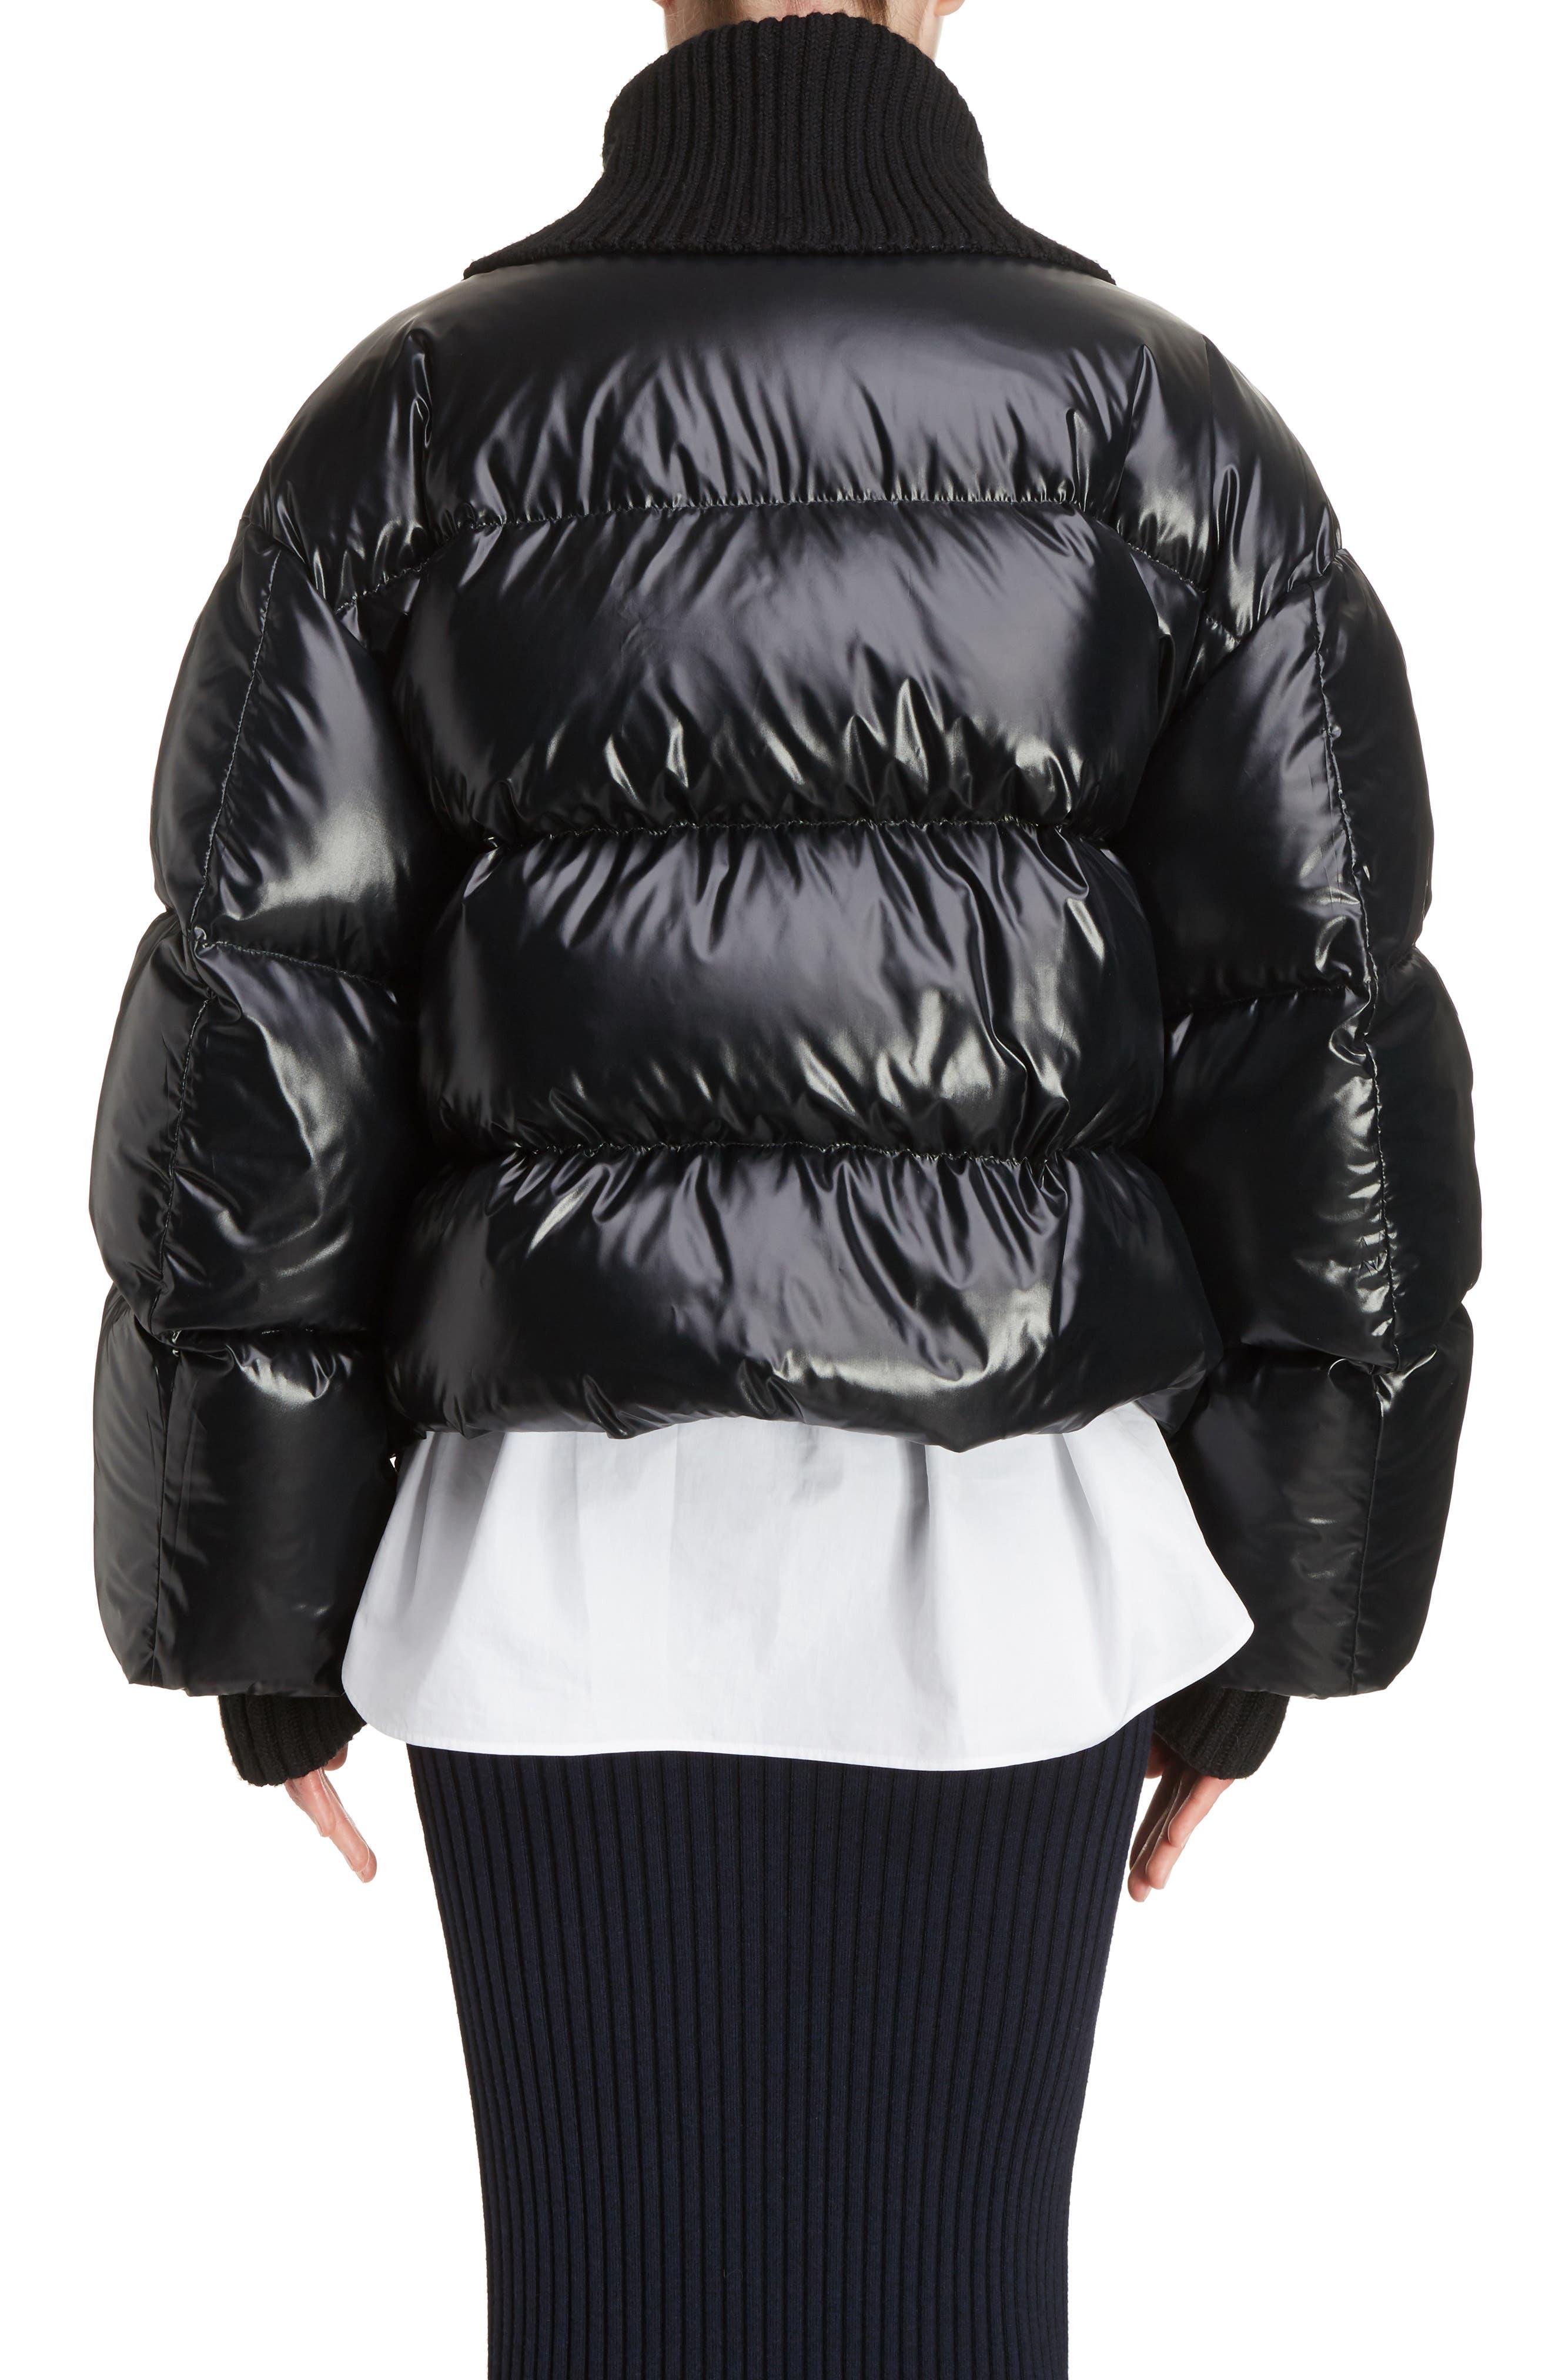 KENZO, Crop Down Puffer Jacket, Alternate thumbnail 2, color, 001